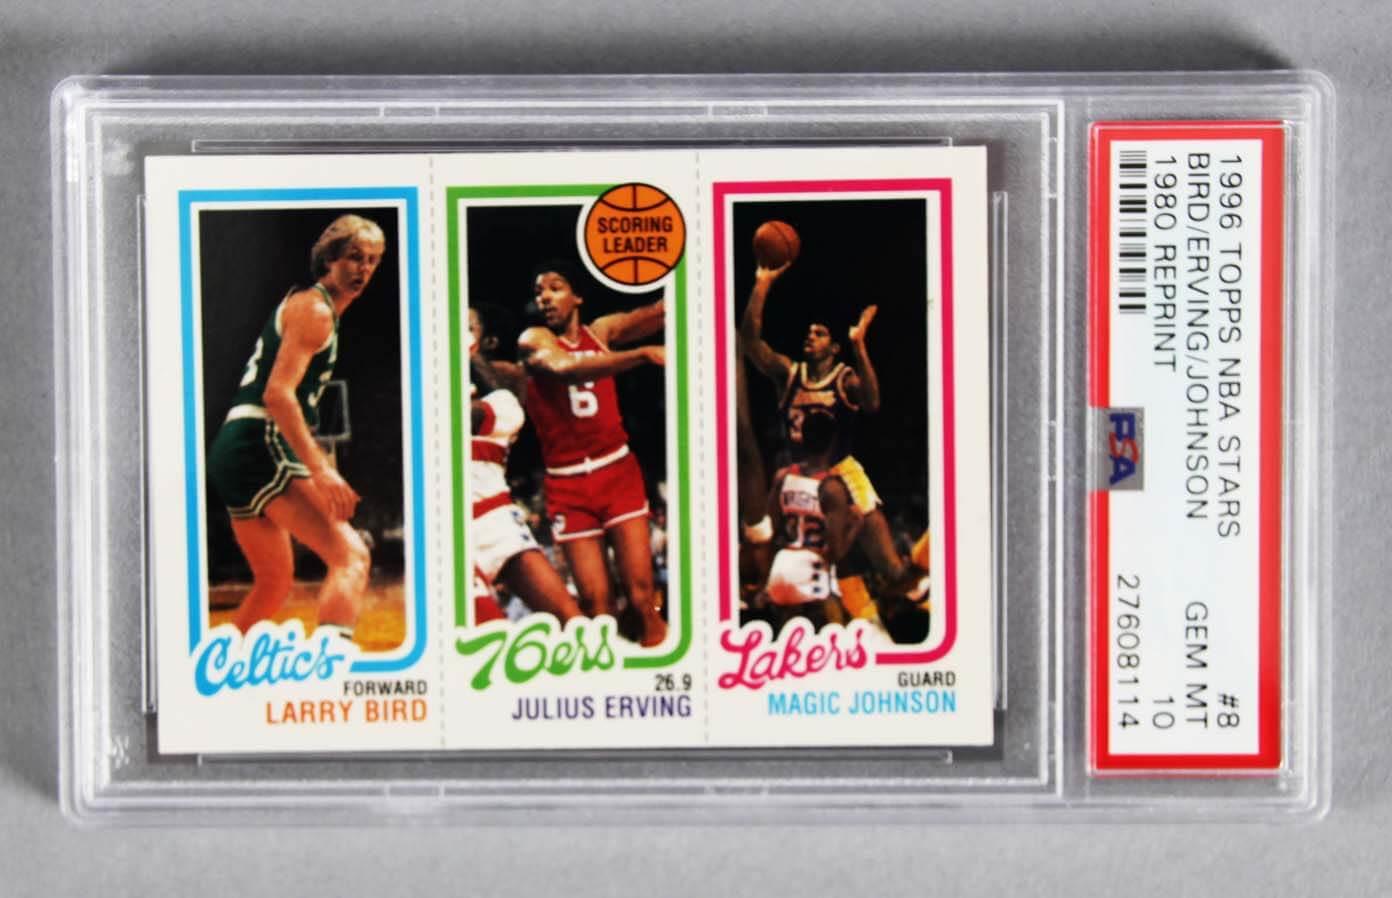 1996 Topps Nba Stars Larry Bird Julius Erving Magic Johnson Rookie Card Psa Graded Gem Mt 10